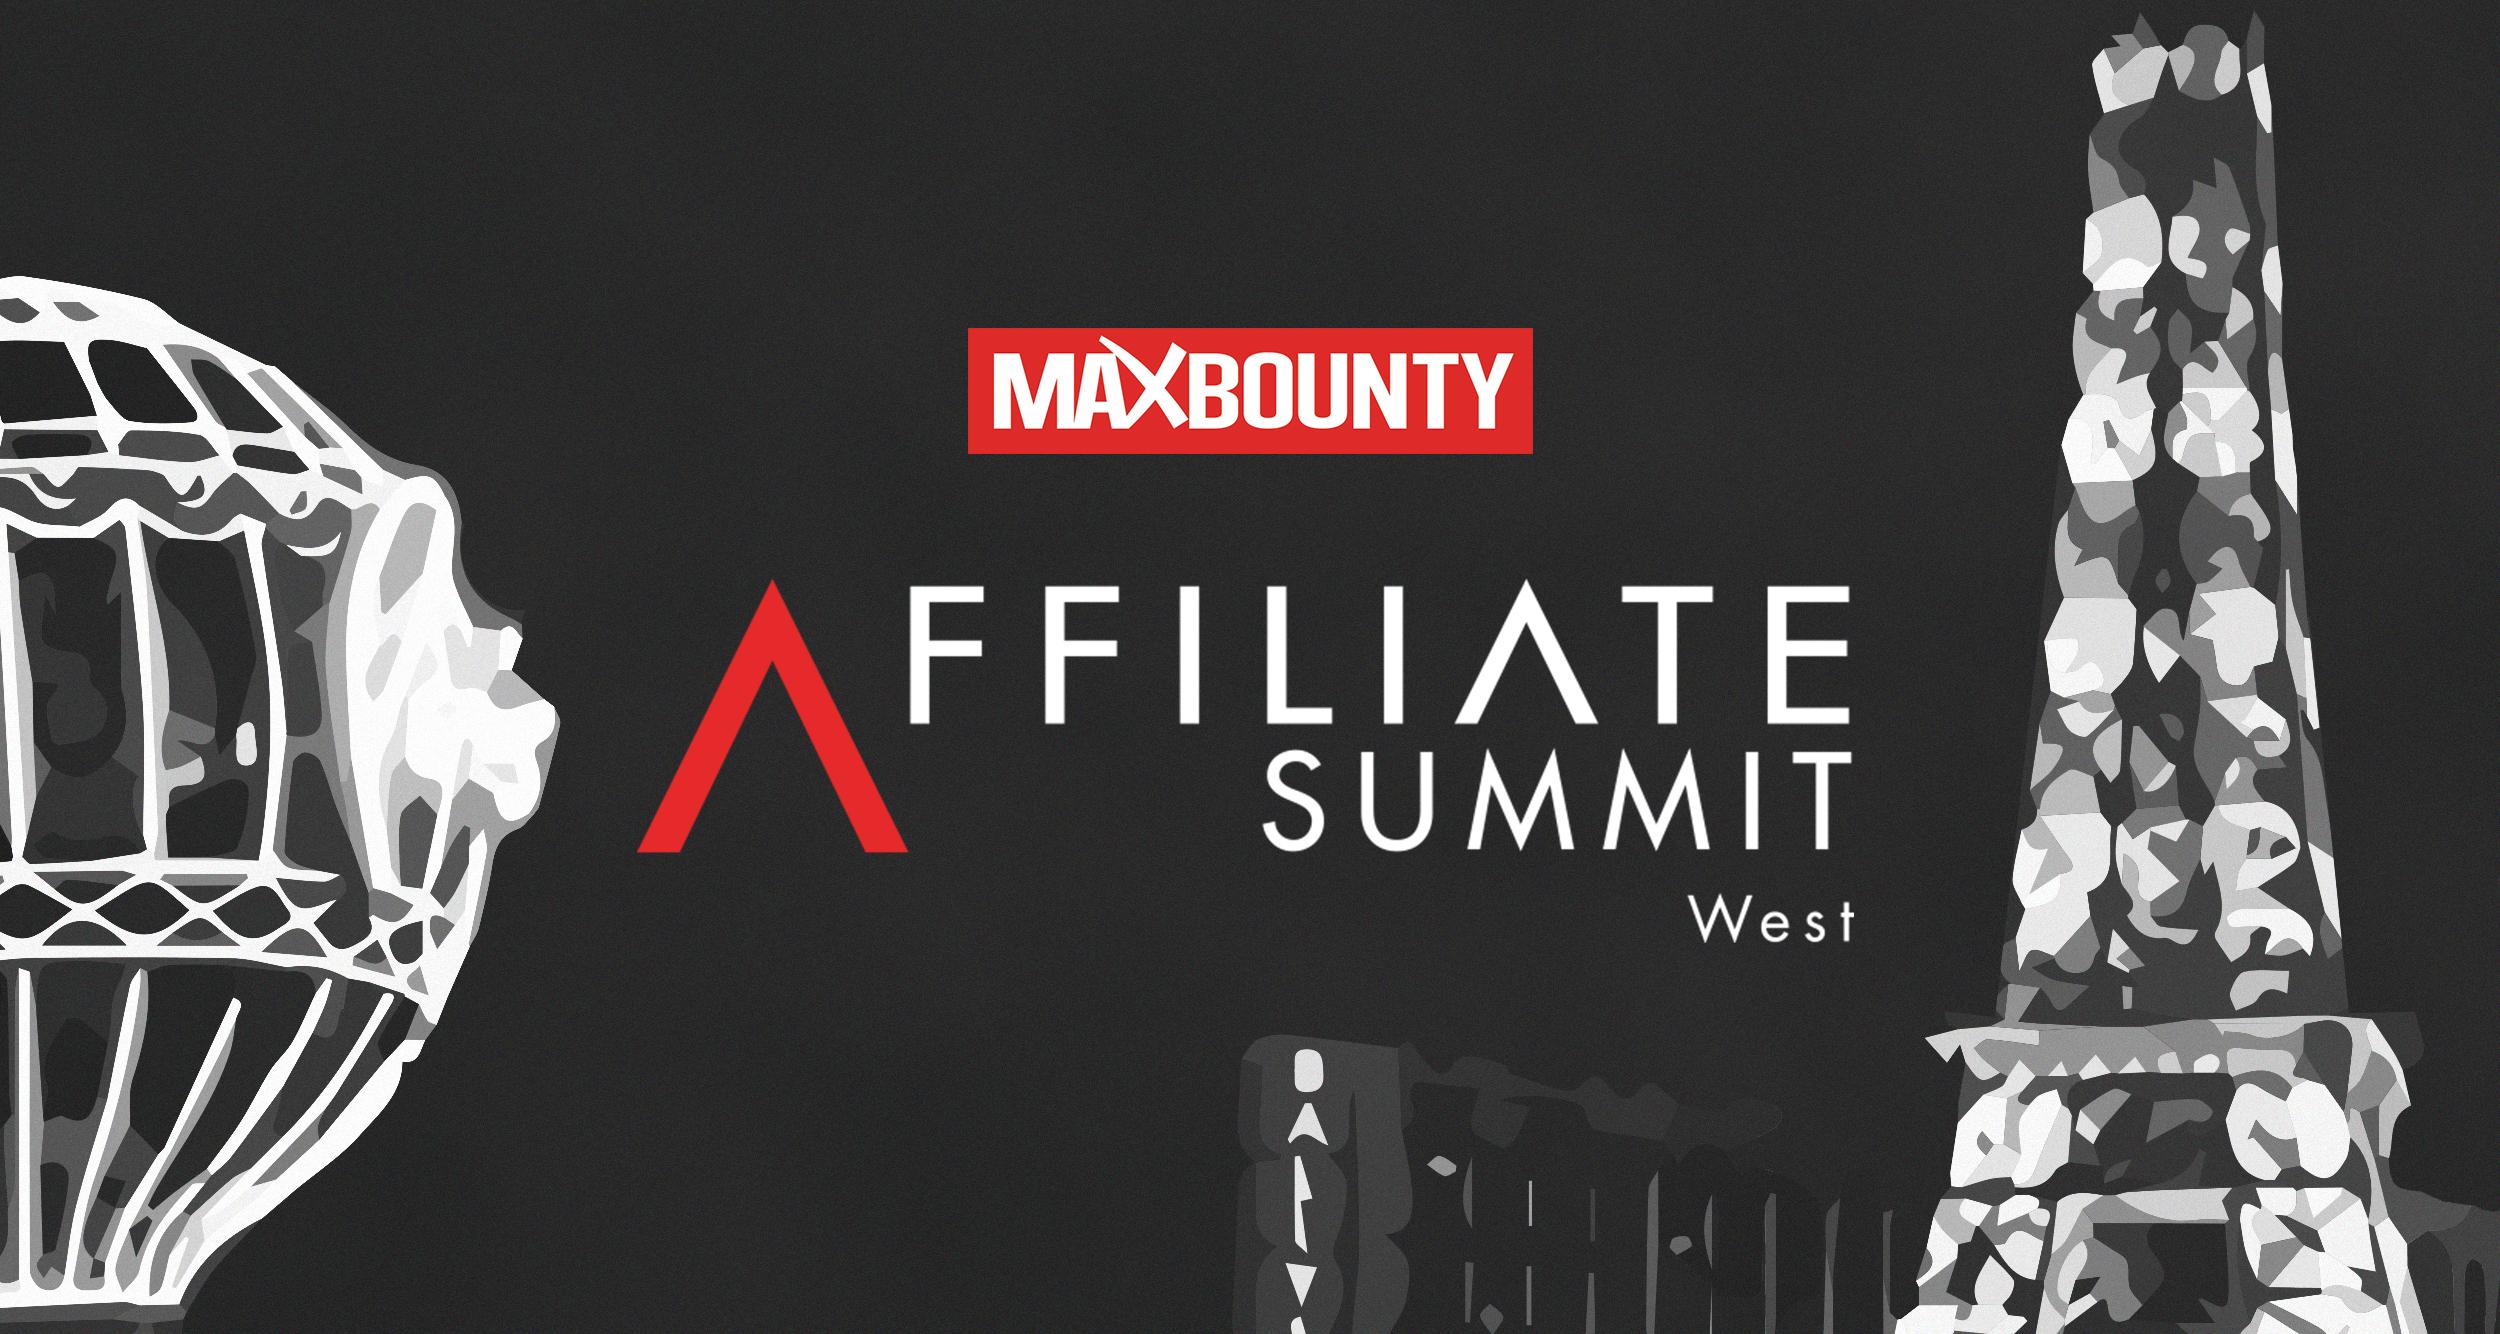 Meet MaxBounty in Vegas at Affiliate Summit West '19